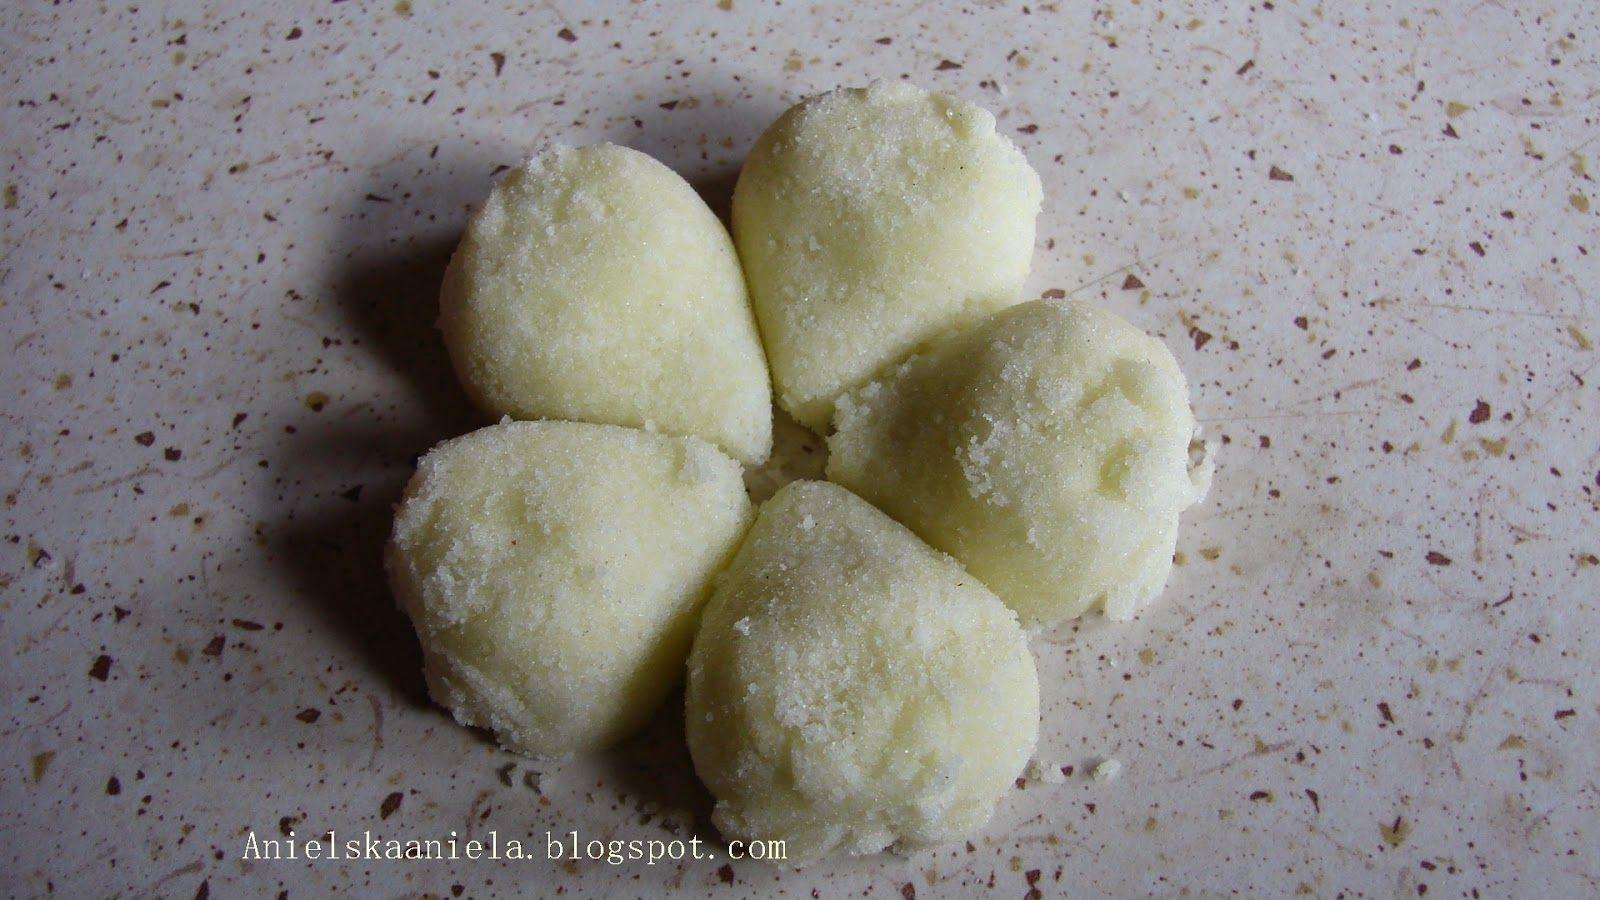 homemade effervescent bath tablets recipe piasek do kapieli,tabletki kule diy przepis krok po kroku